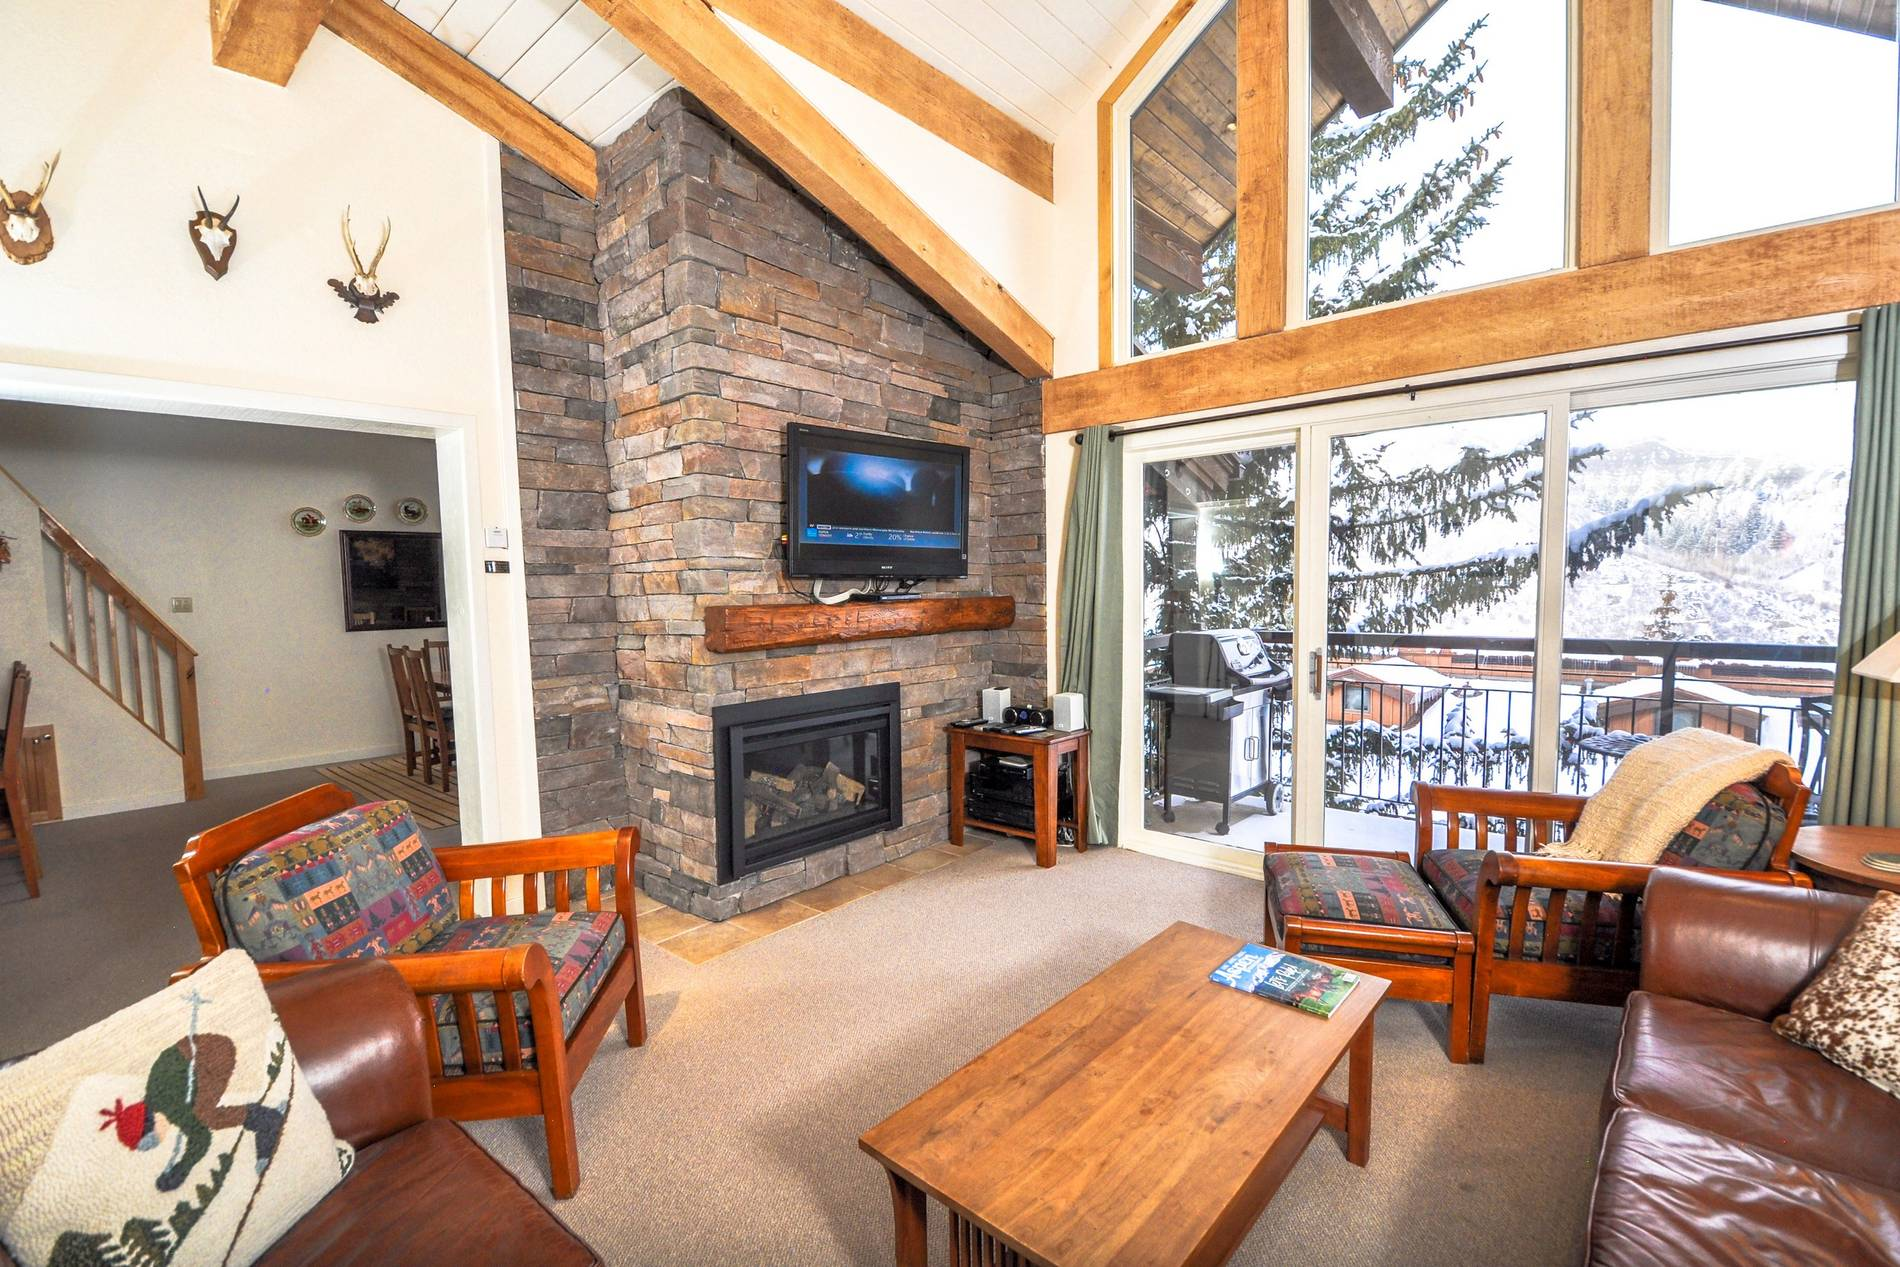 400 Wood Road, Unit 3307 Snowmass Village Photo